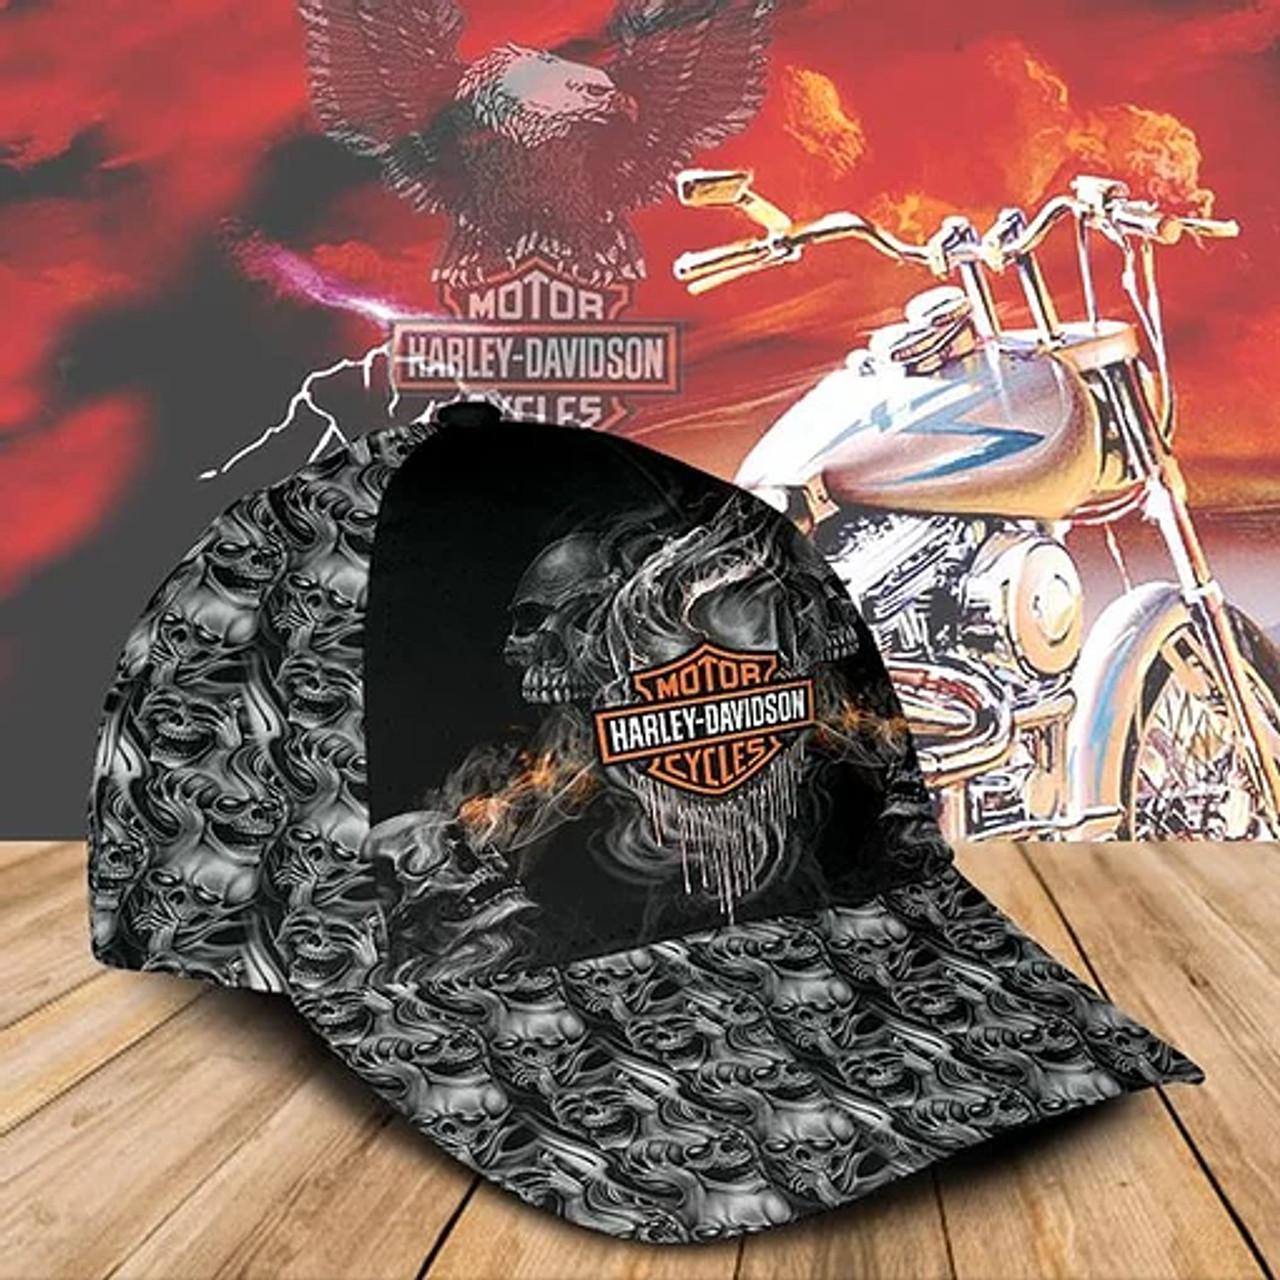 **(OFFICIAL-HARLEY-DAVIDSON-MOTORCYCLE-BIKER-CAPS/CUSTOM-GRAPHIC-3D-PRINTED-HARLEY-SKULLS-DESIGN)**